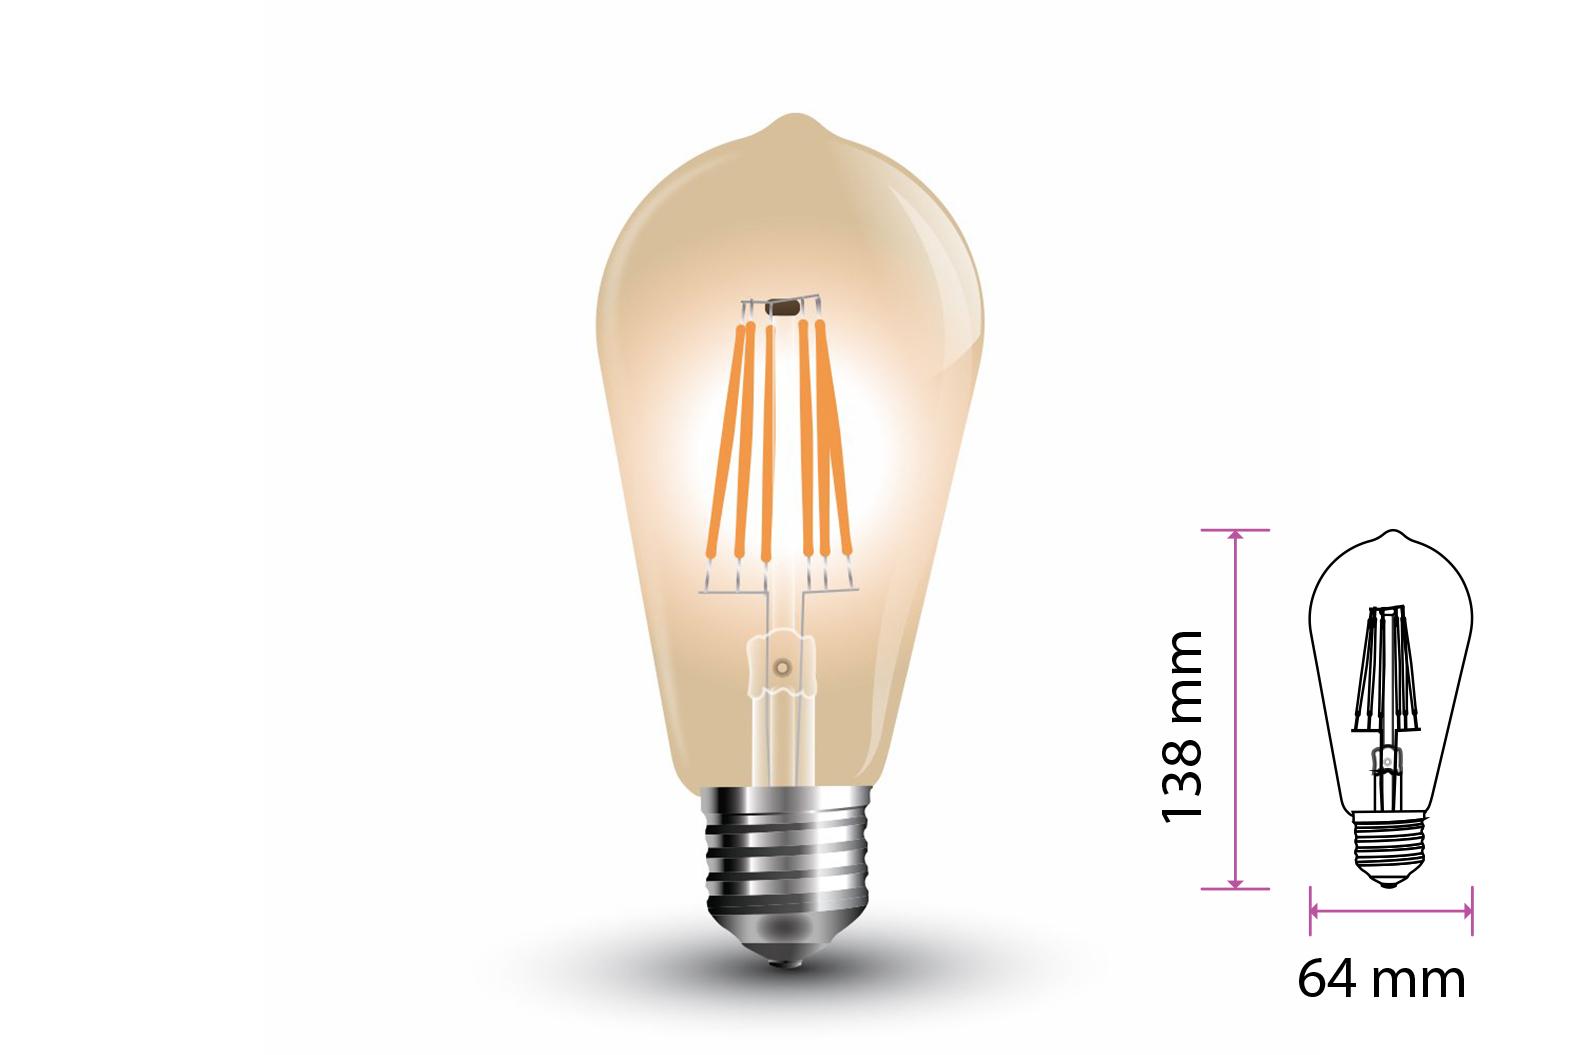 Lampada Filo Led a Filamento E27 ST64 4W Bianco Caldo 2200K Cover Amber Vintage SKU-4361 - PZ